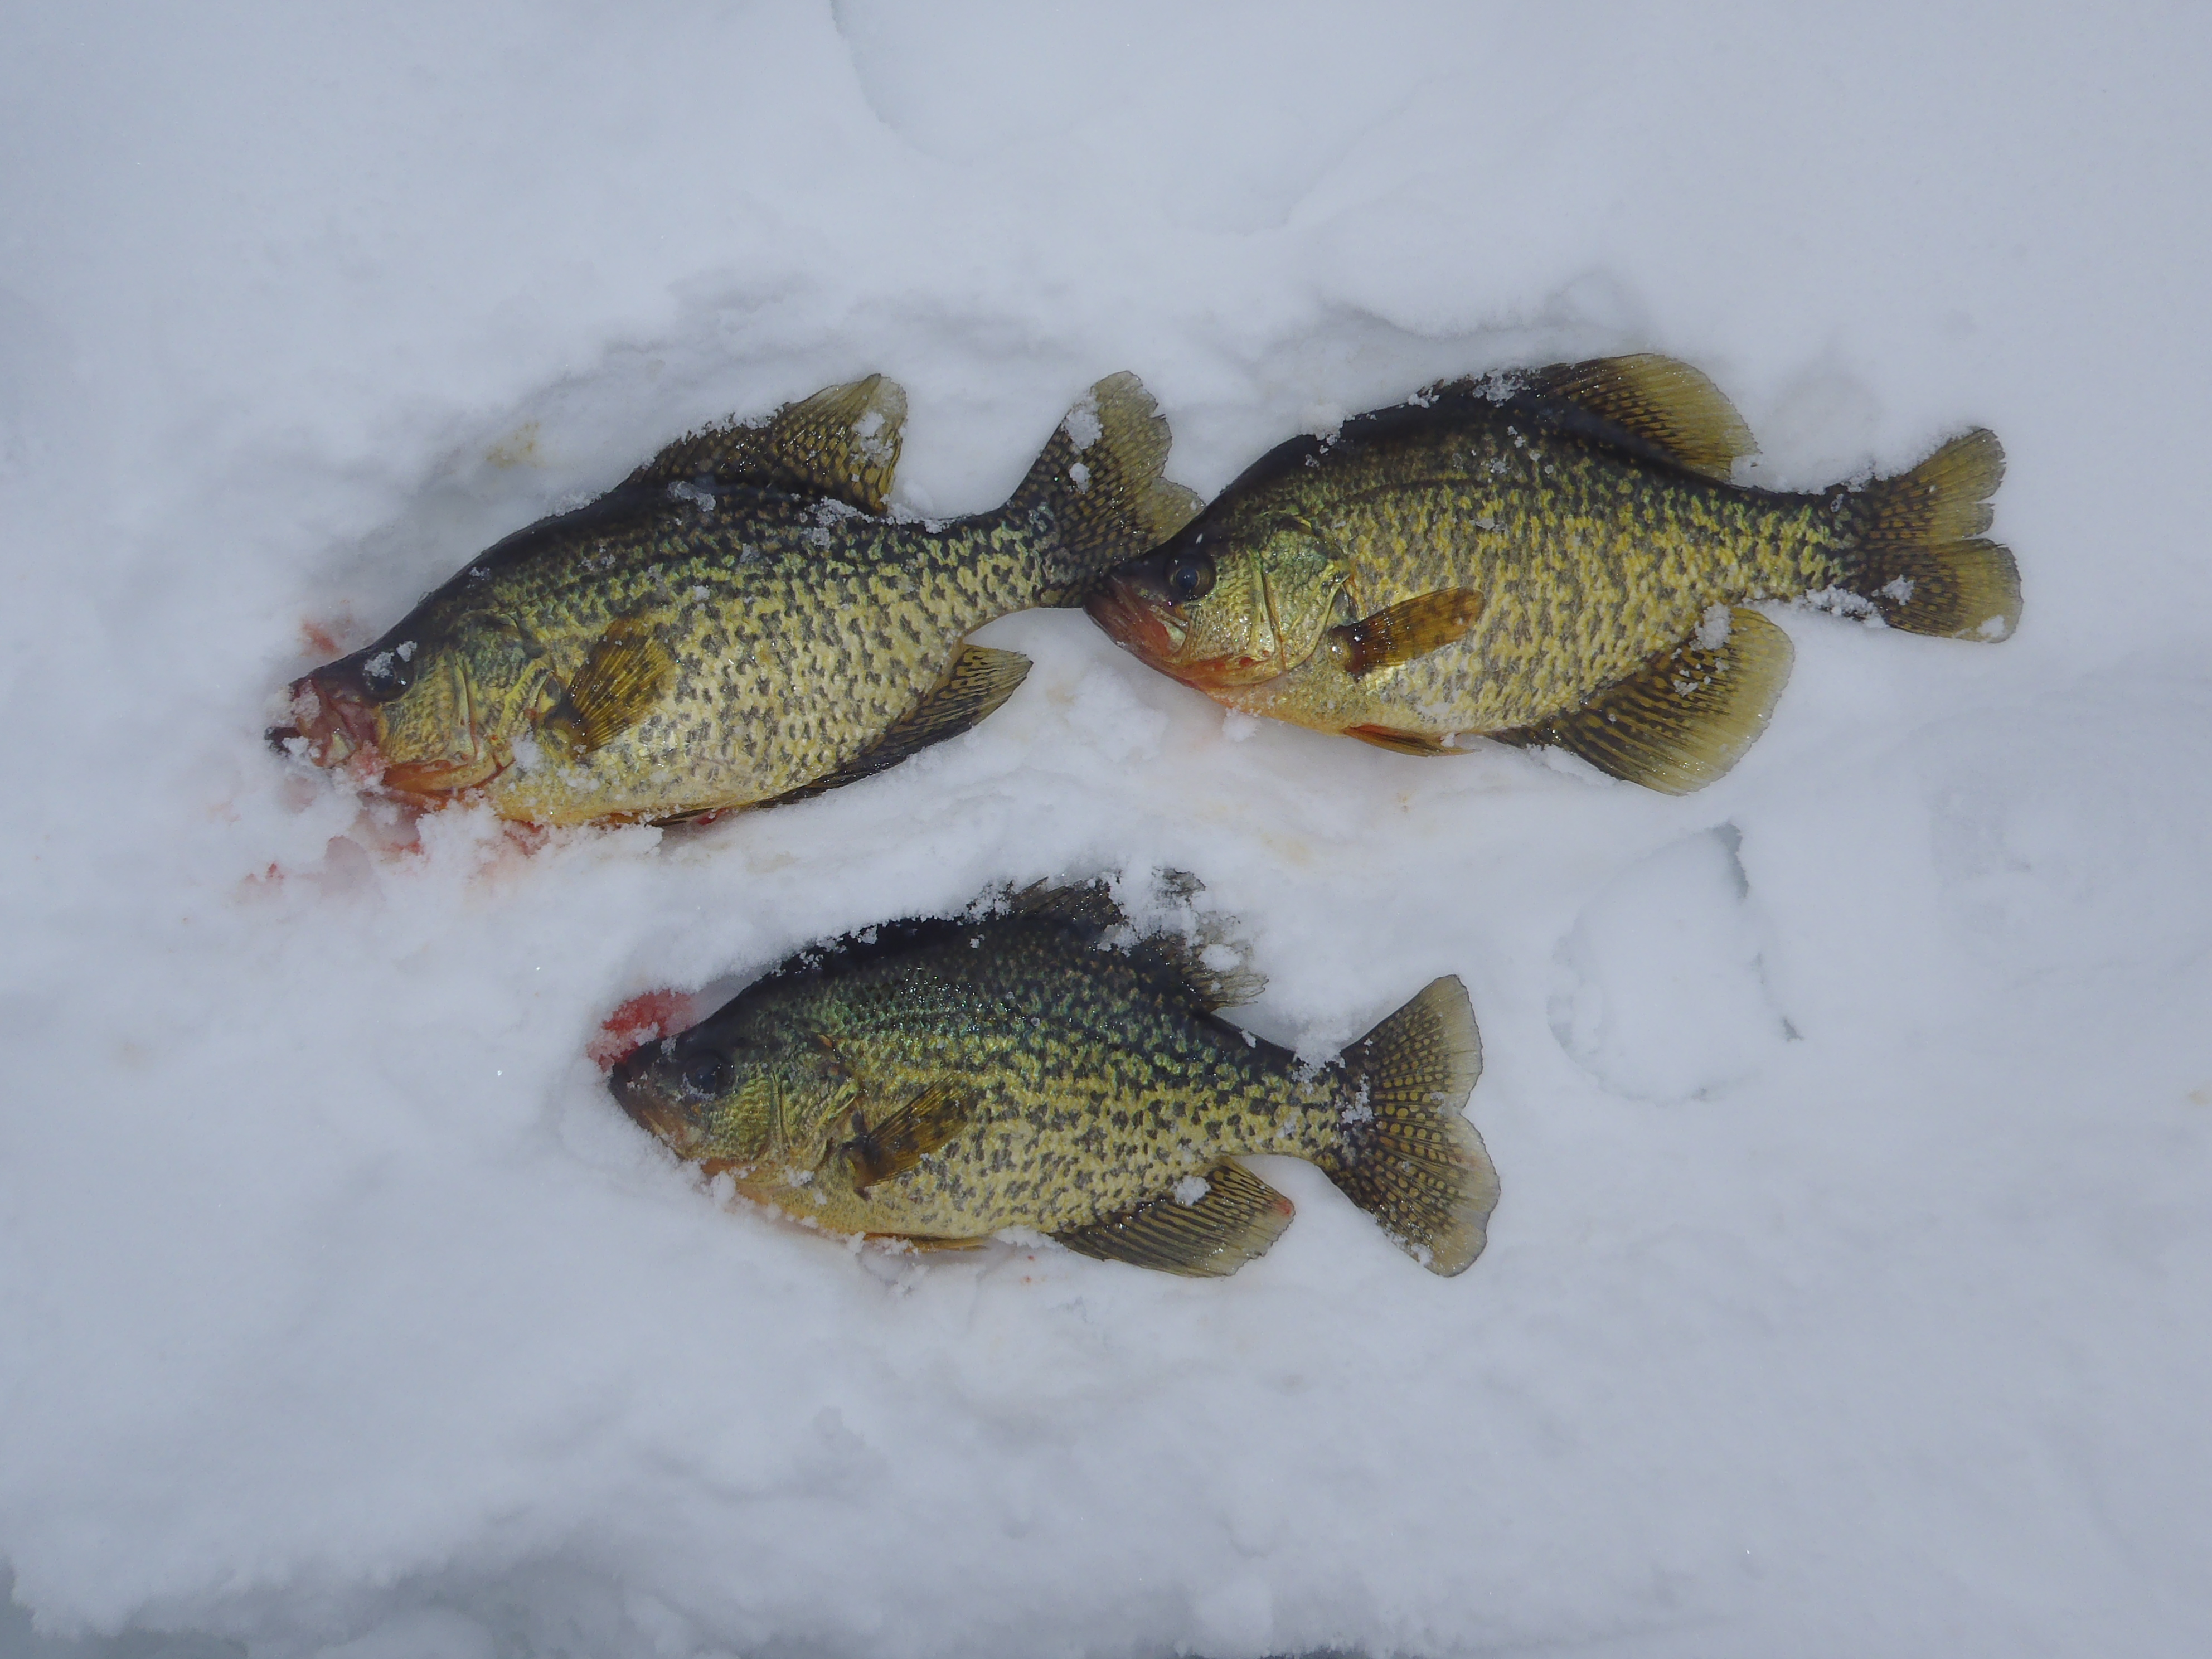 Ice fishing is crappie ice fishing ontario fishing for Crappie ice fishing